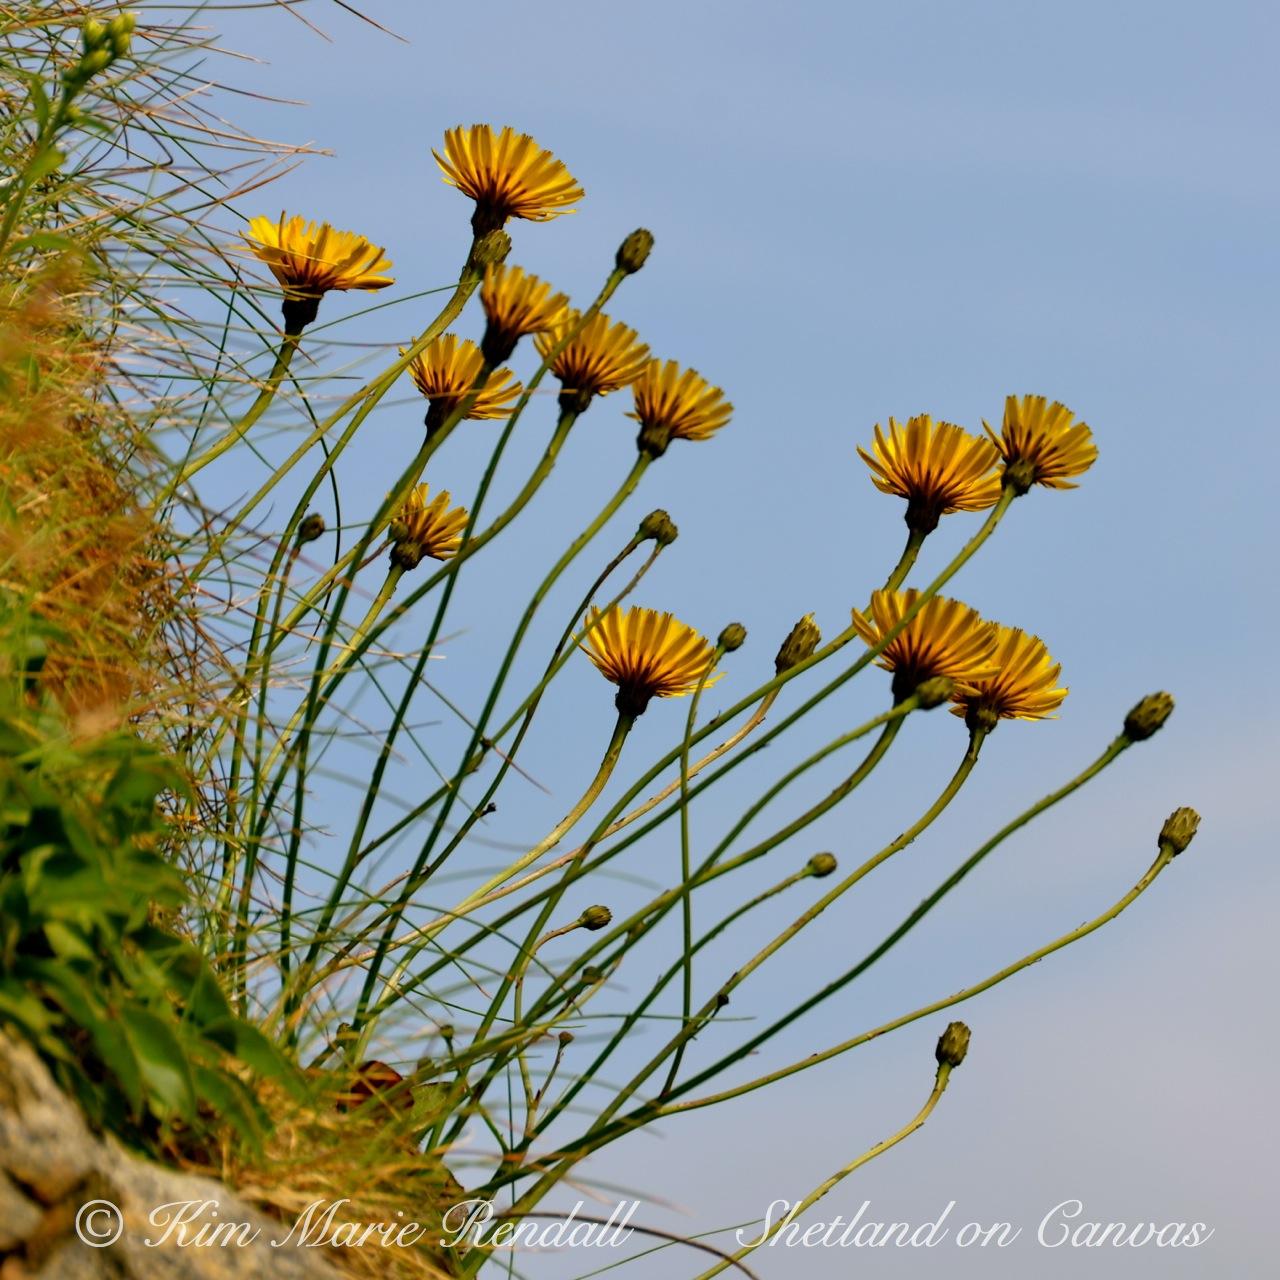 Cliff-side Dandelions, Unst